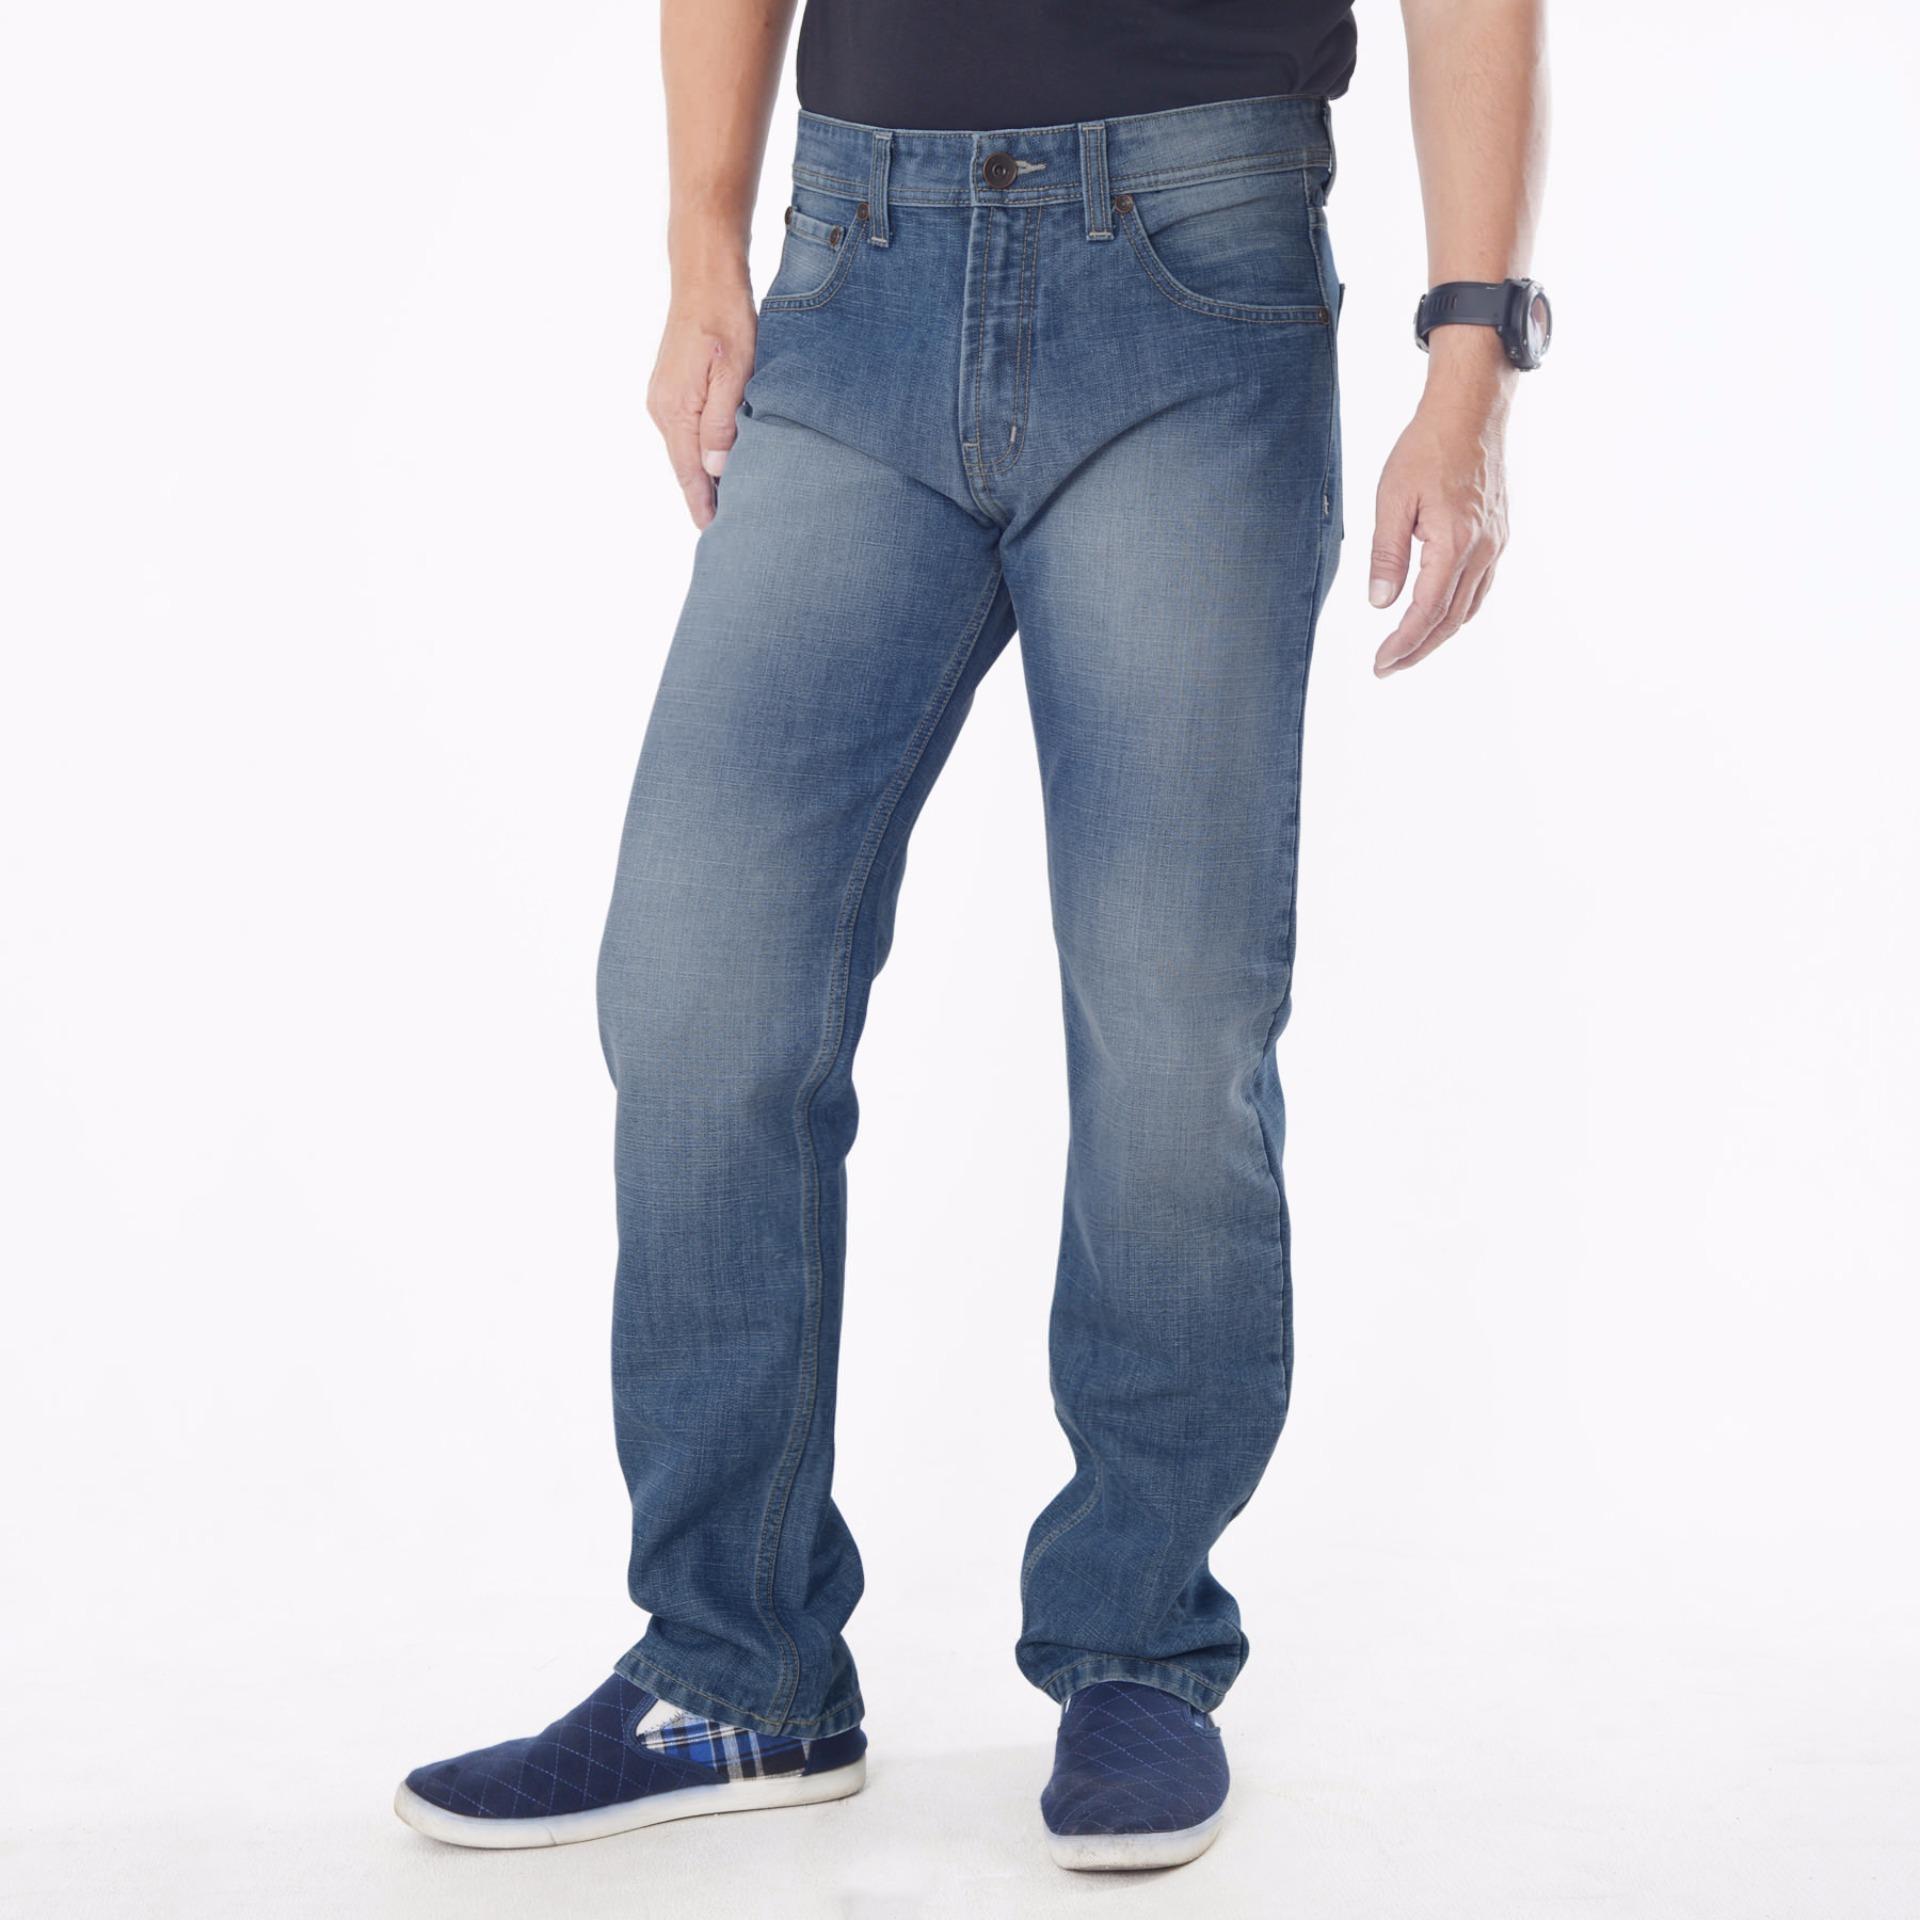 Emba Jeans Celana Panjang Pria BS 08A.1 Jordan Regular - Heavy Stone Medium